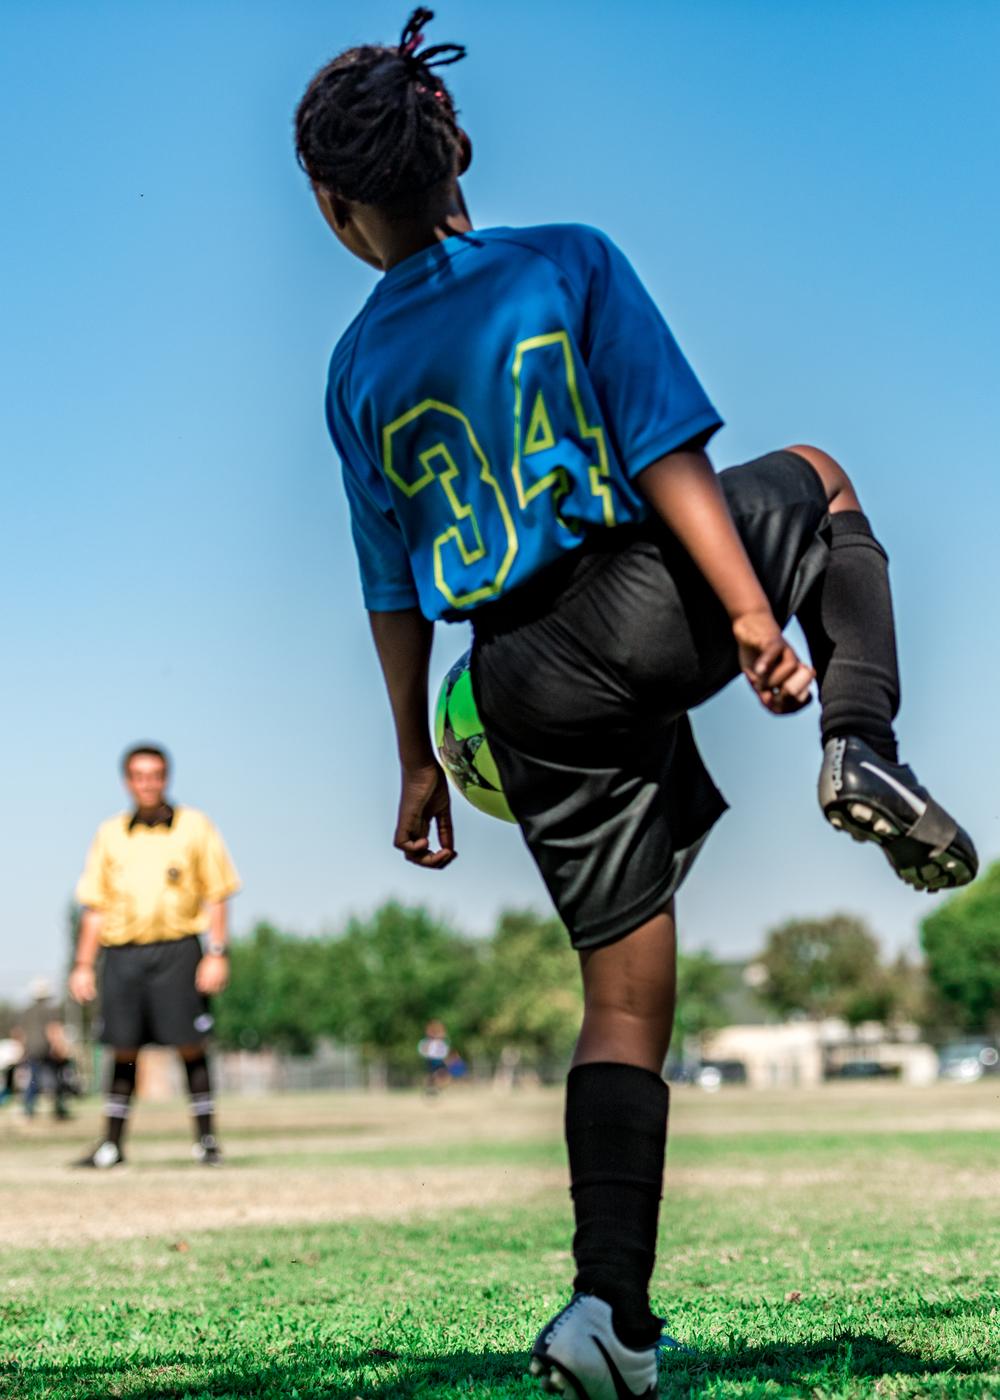 kylie soccer 9-19-15-3.jpg